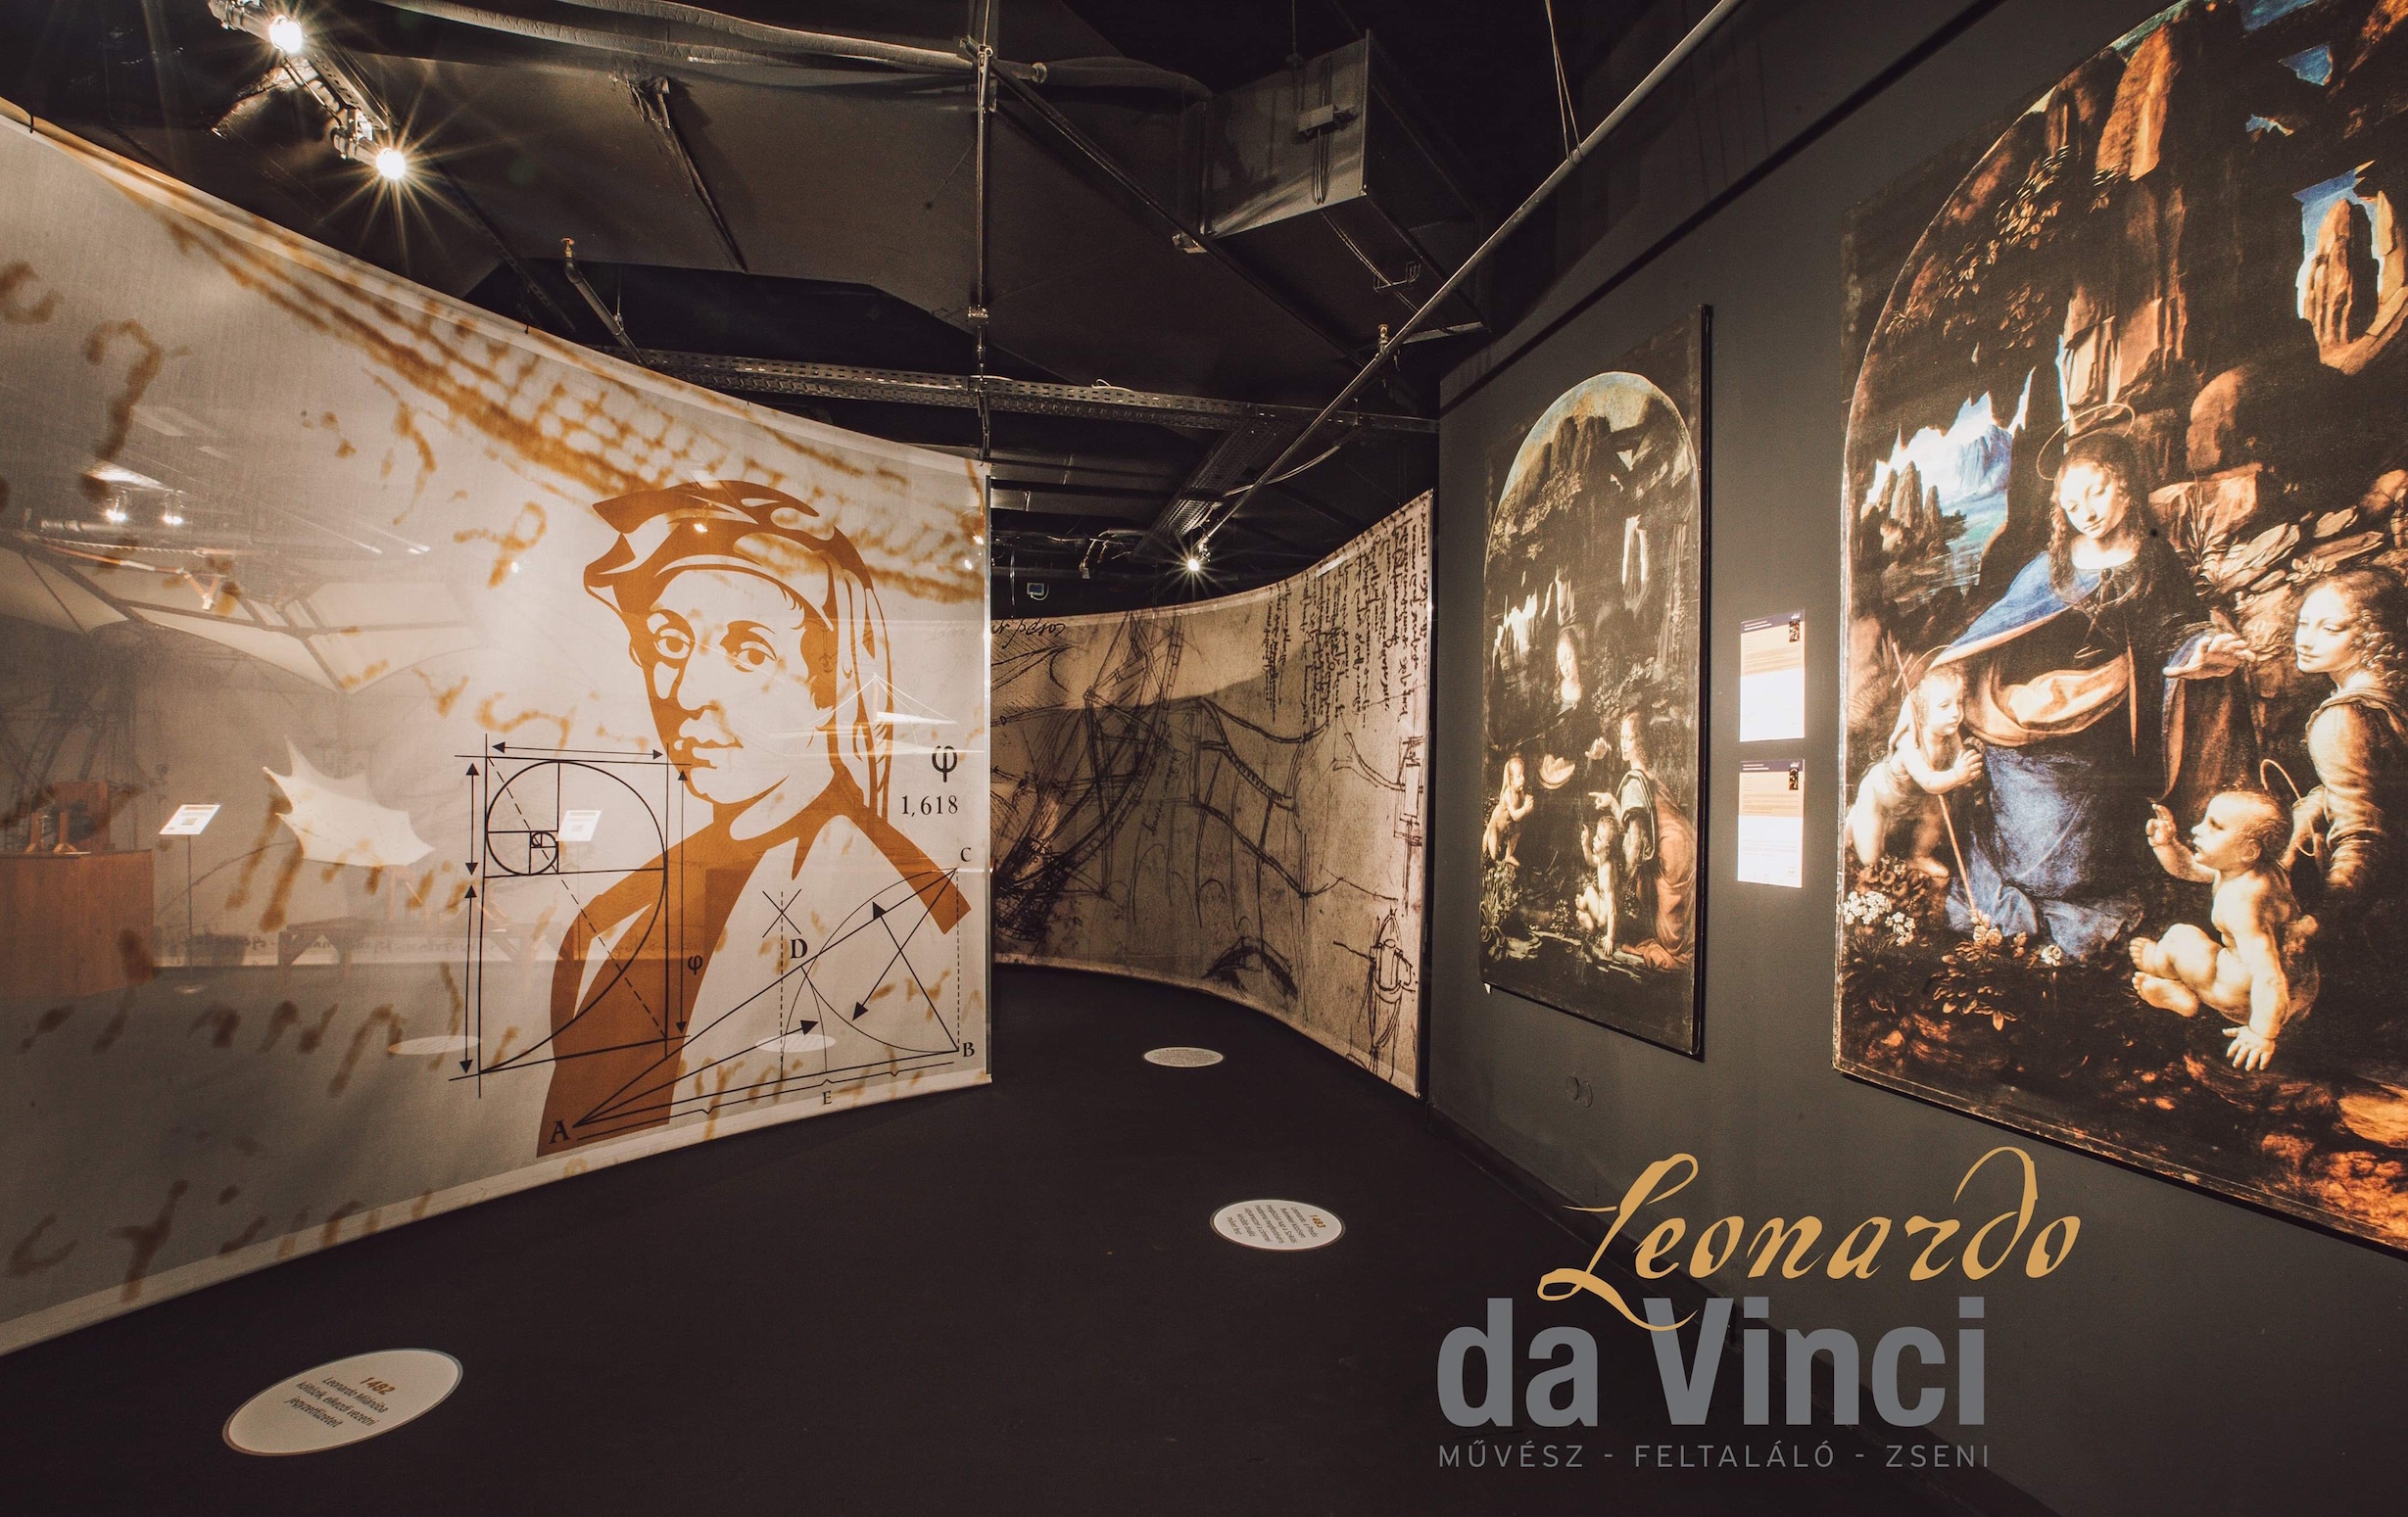 leonardo da vinci exhibition budapest